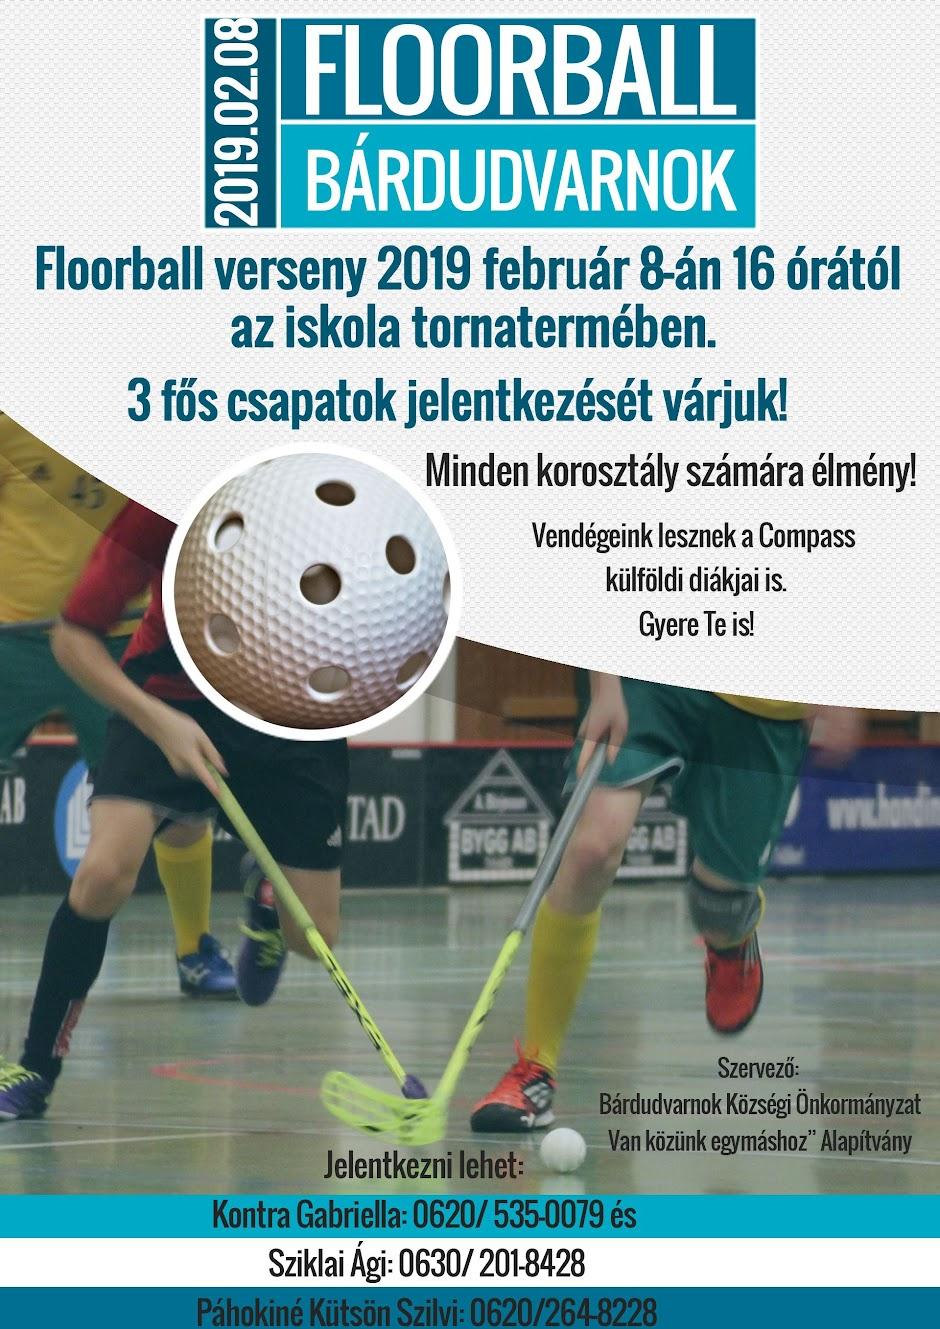 Floorball február 8-án 16 órától